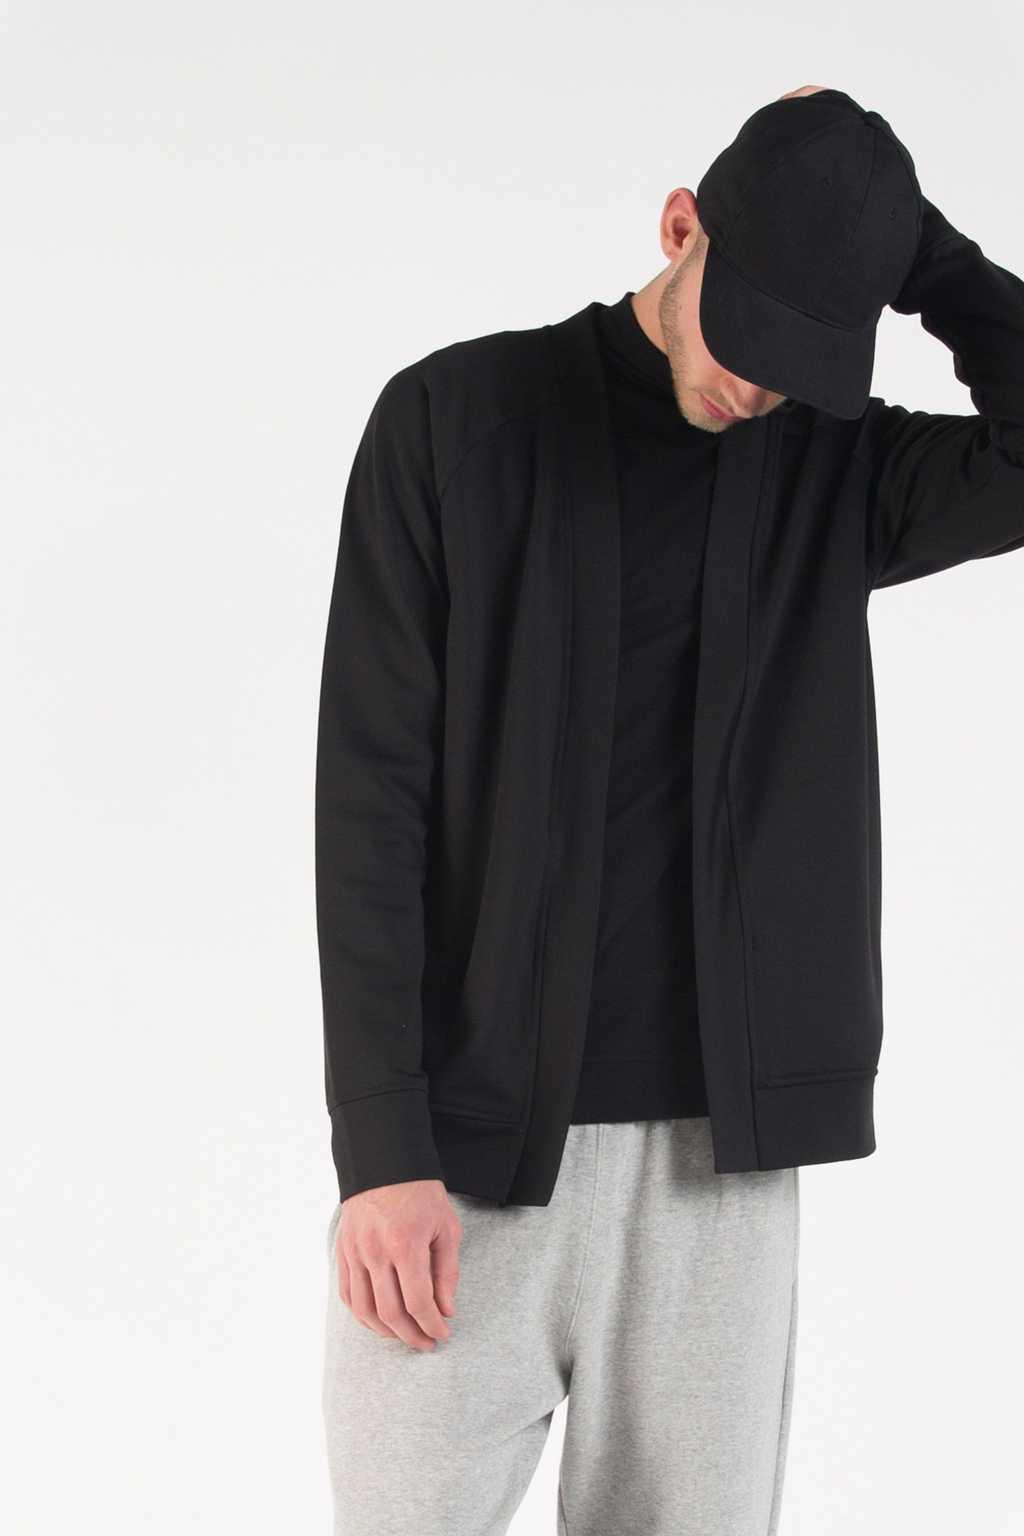 Cardigan 7233 Black 1